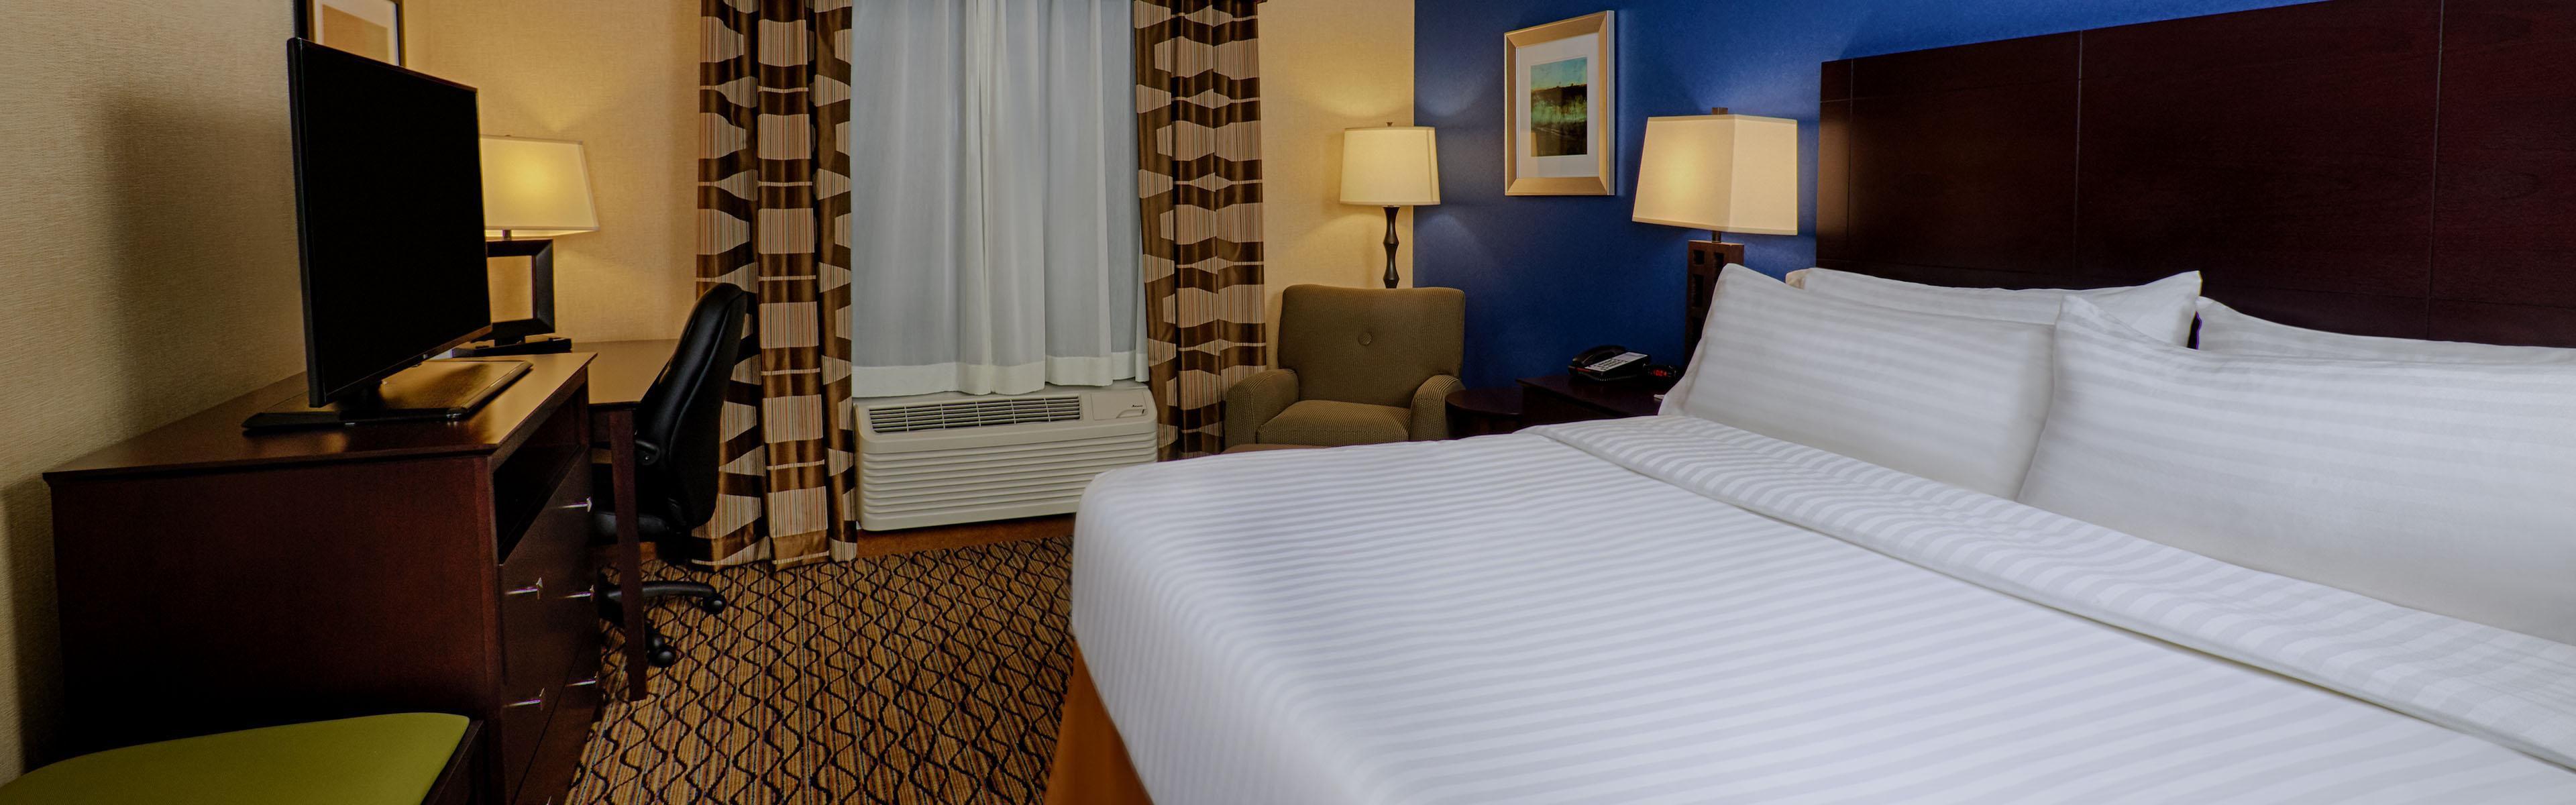 Holiday Inn Express Bordentown - Trenton South image 1